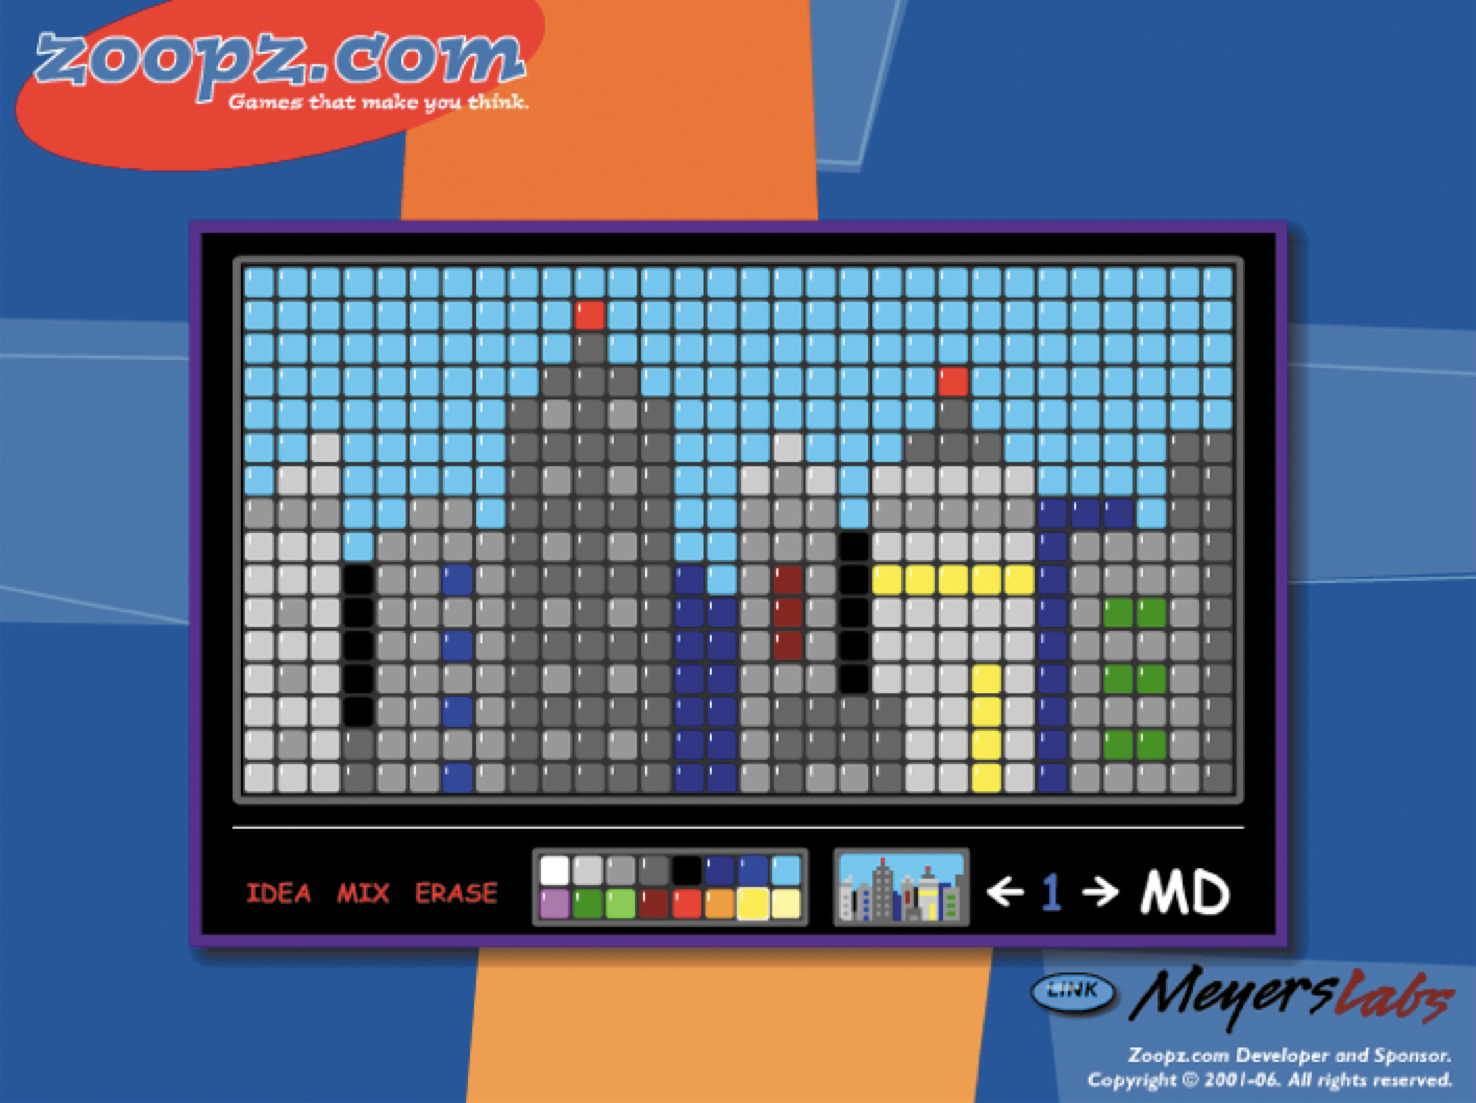 Screenshot of a Zoopz.com mosaic